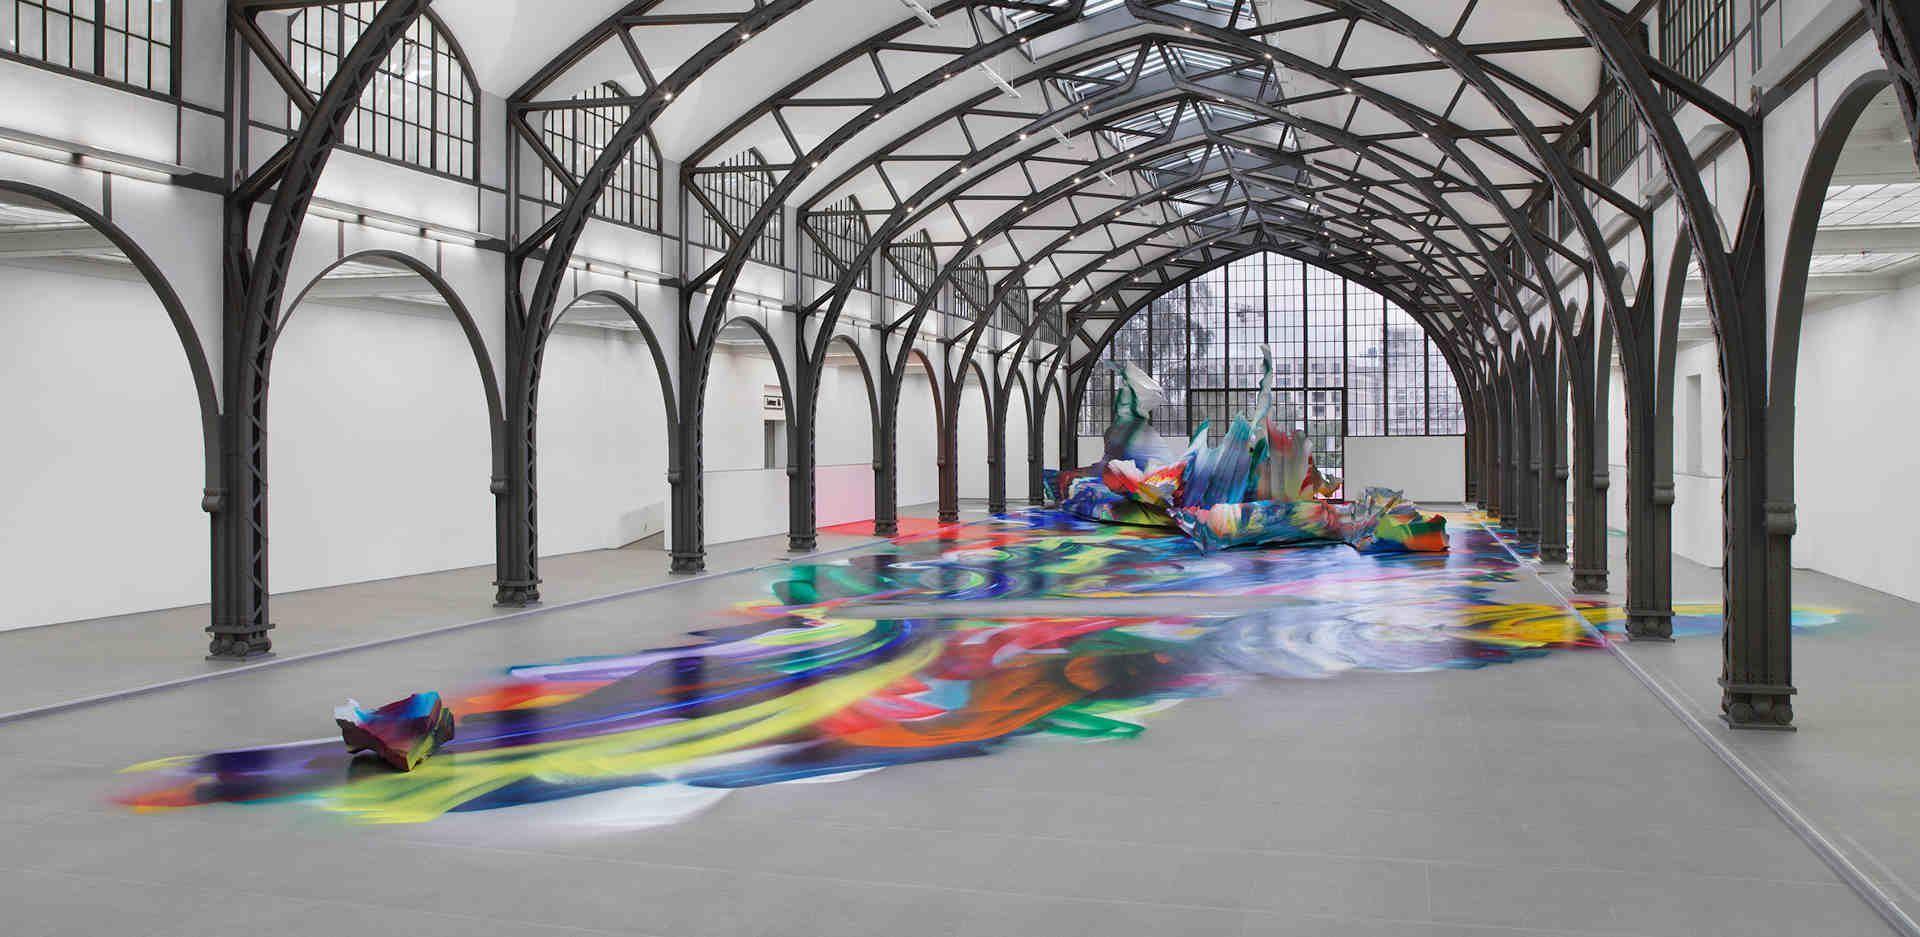 German government seeks to buy Hamburger Bahnhof museum from investor | The  Art Newspaper in 2020 | German government, Gallery weekend, Museum